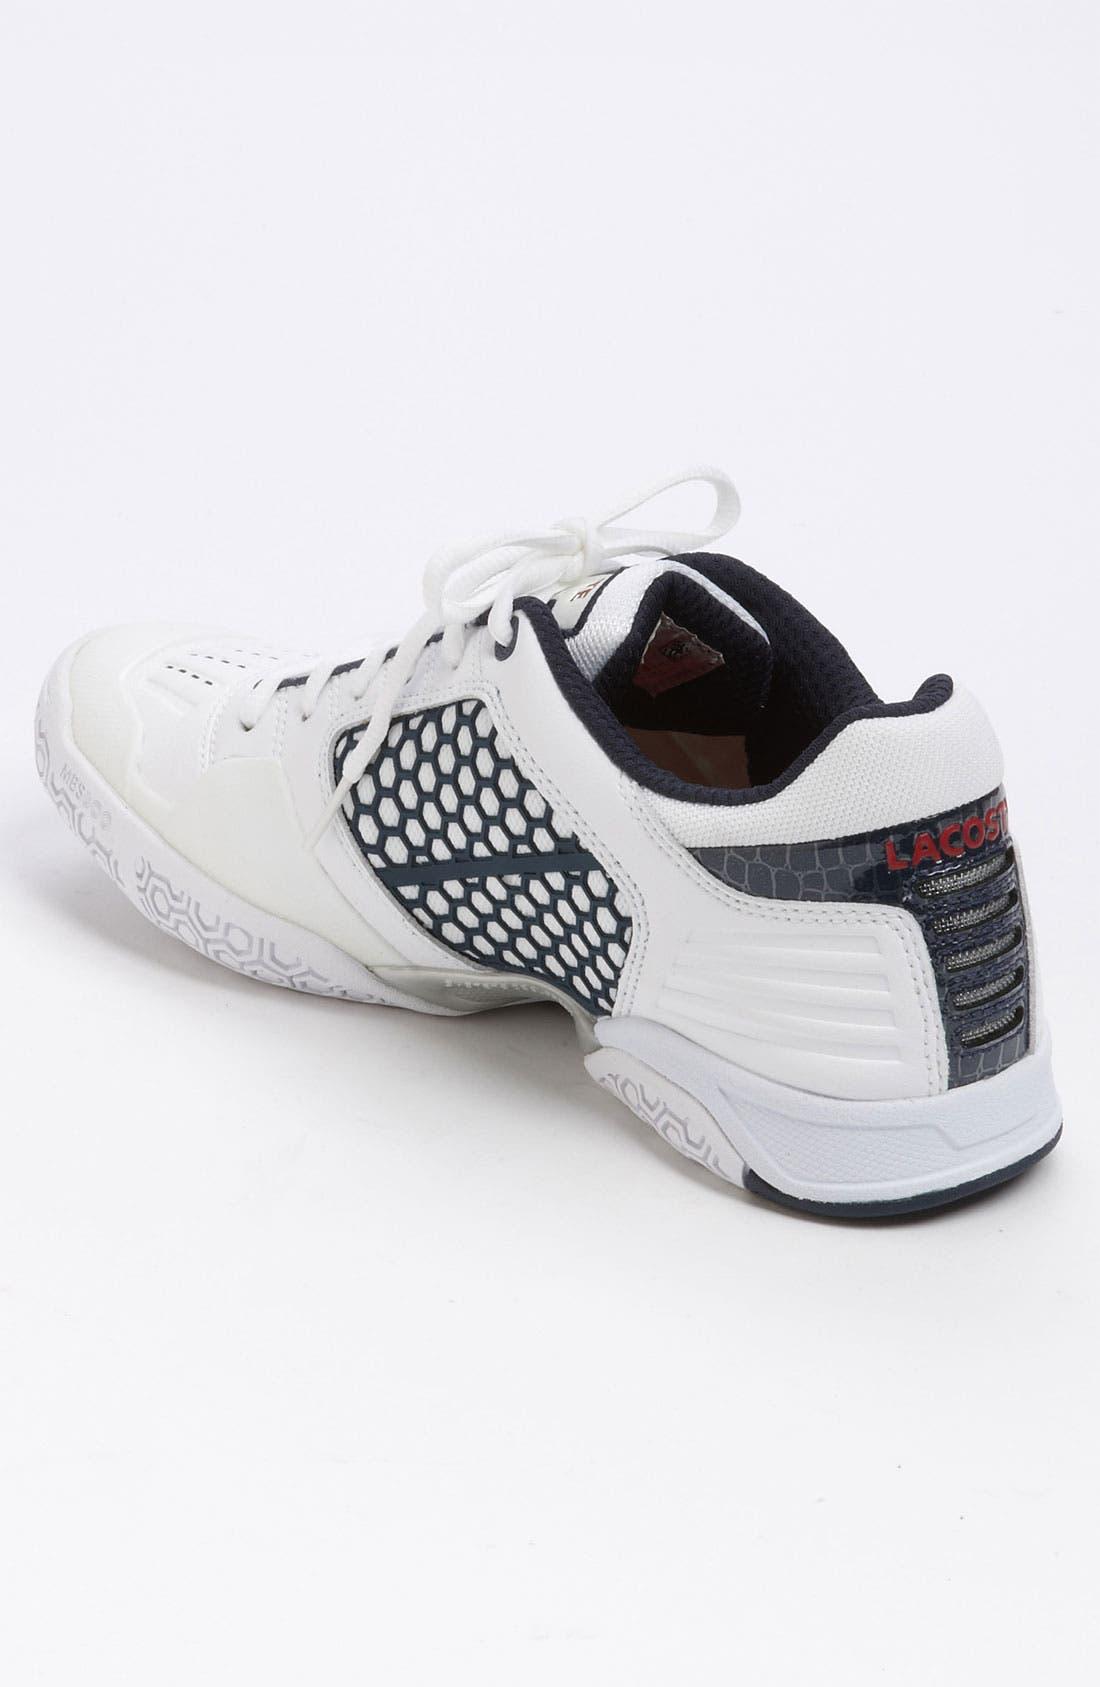 Alternate Image 2  - Lacoste 'Repel' Tennis Shoe (Men)